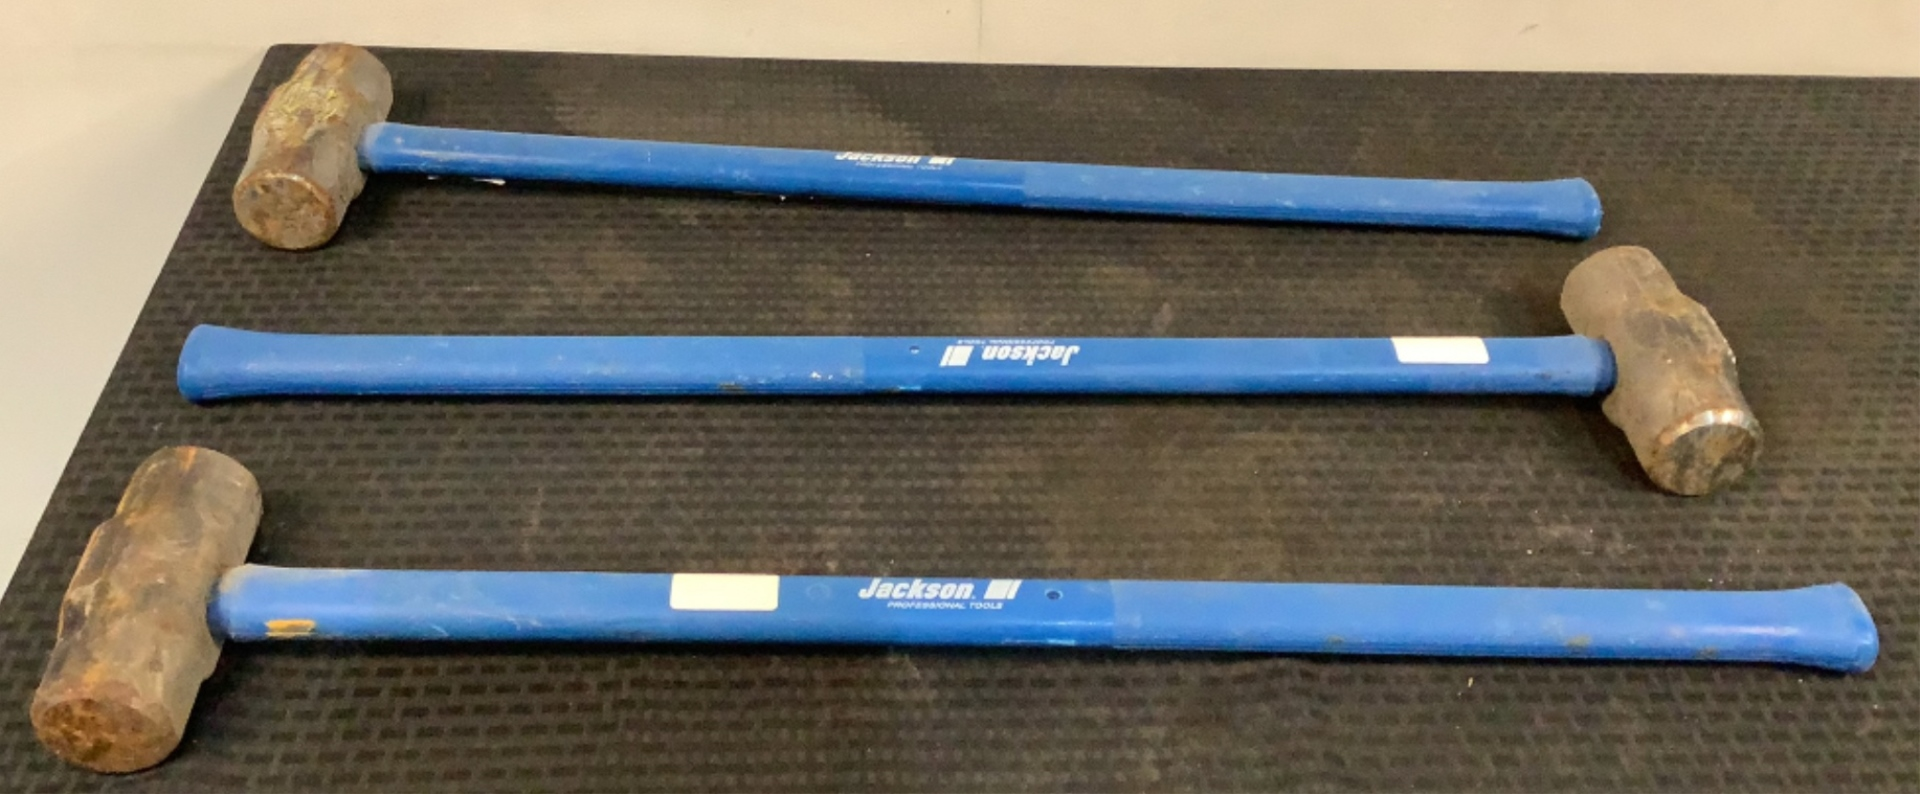 (3) Jackson 8 lb Sledge Hammers